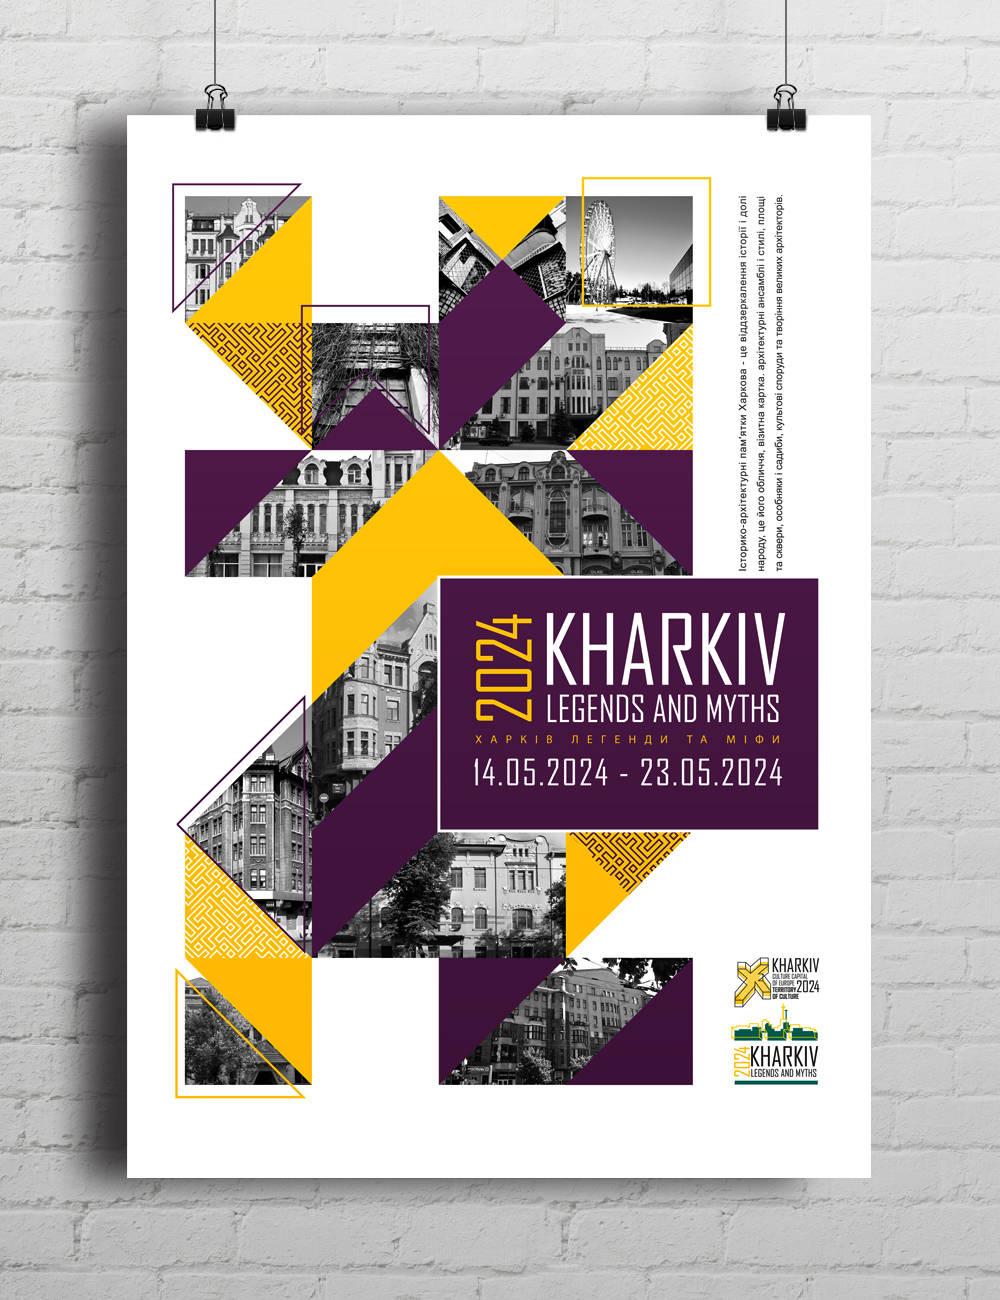 Kharkiv cultural capital of Ukraine 2024